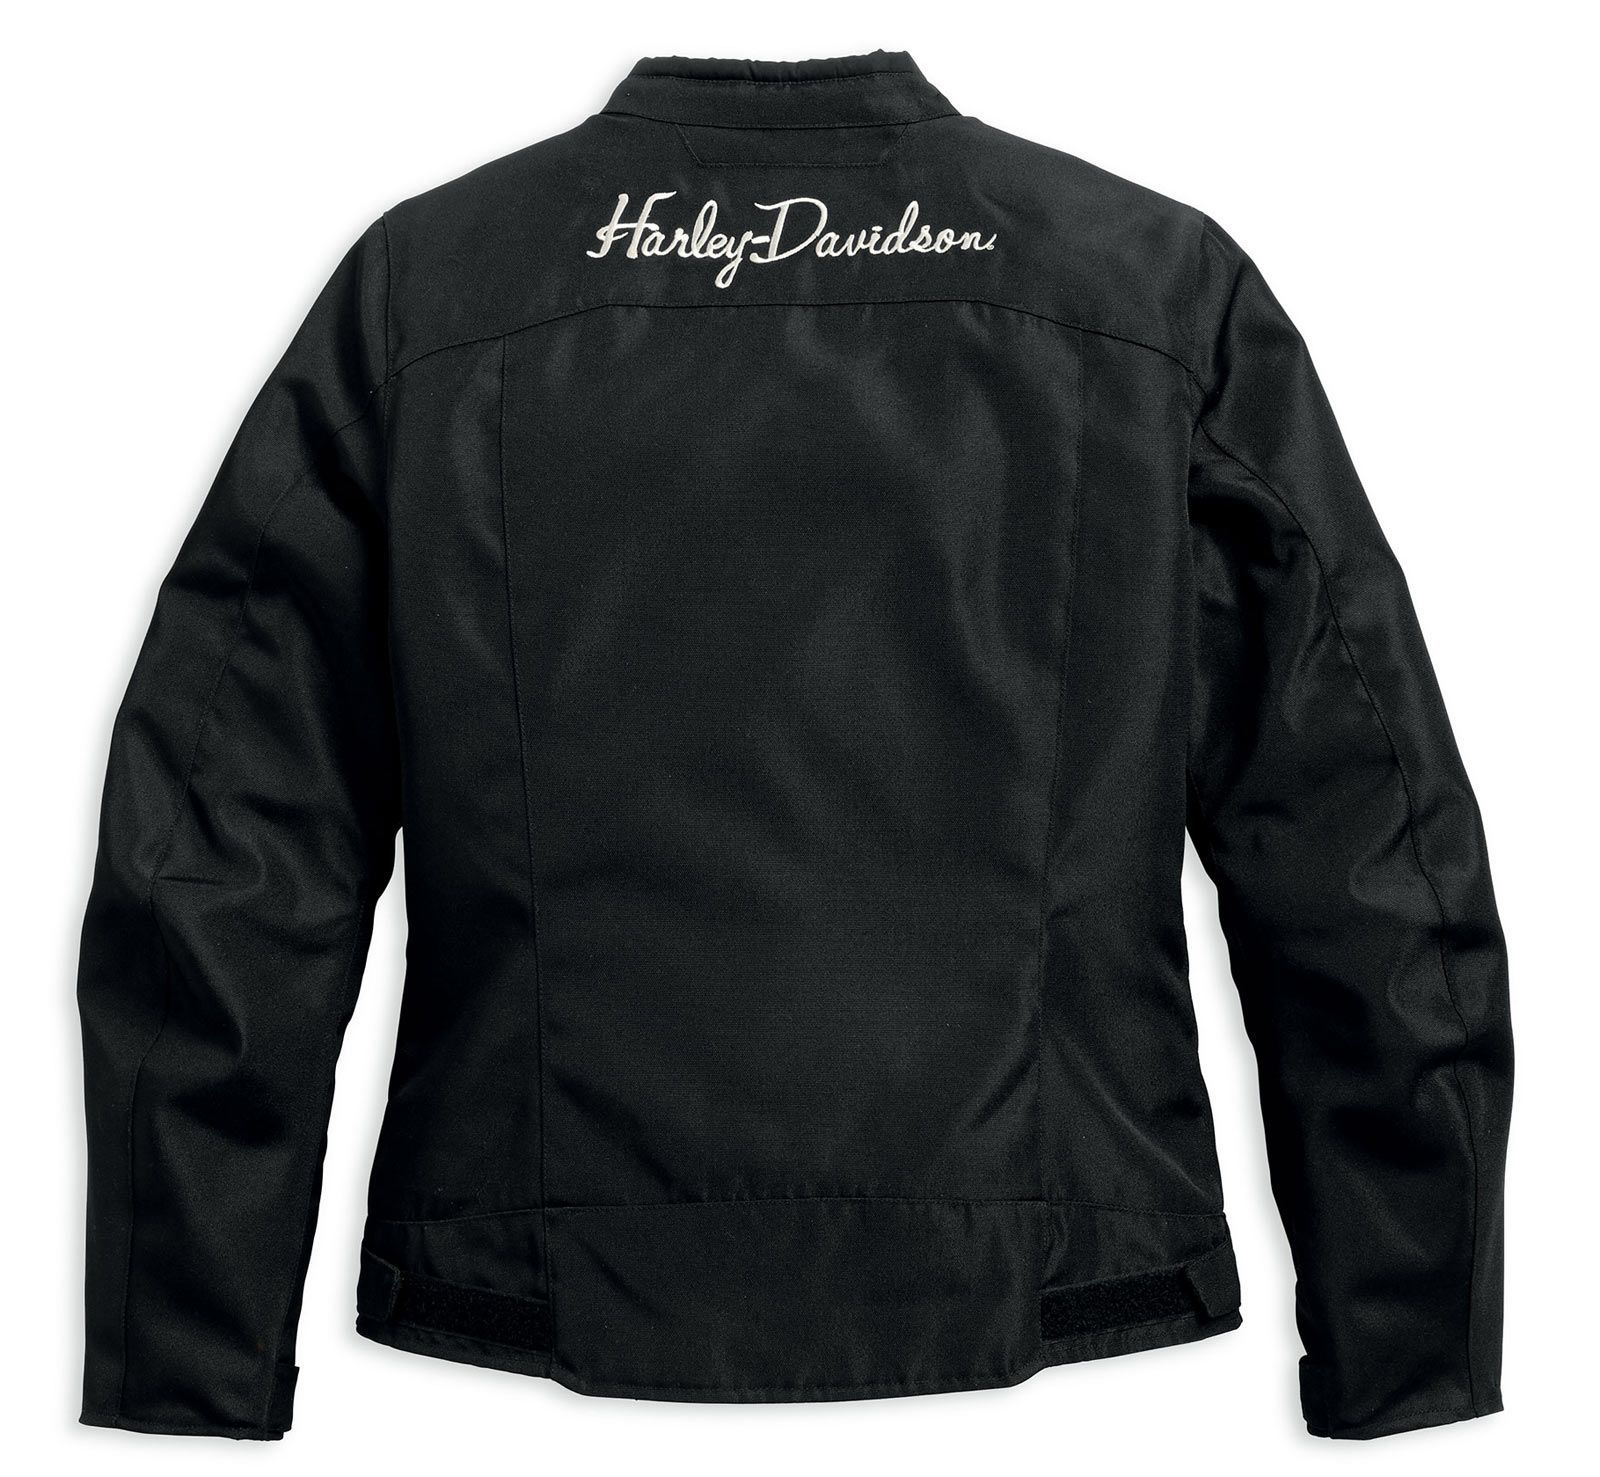 97219 17ew harley davidson women 39 s textile riding jacket. Black Bedroom Furniture Sets. Home Design Ideas